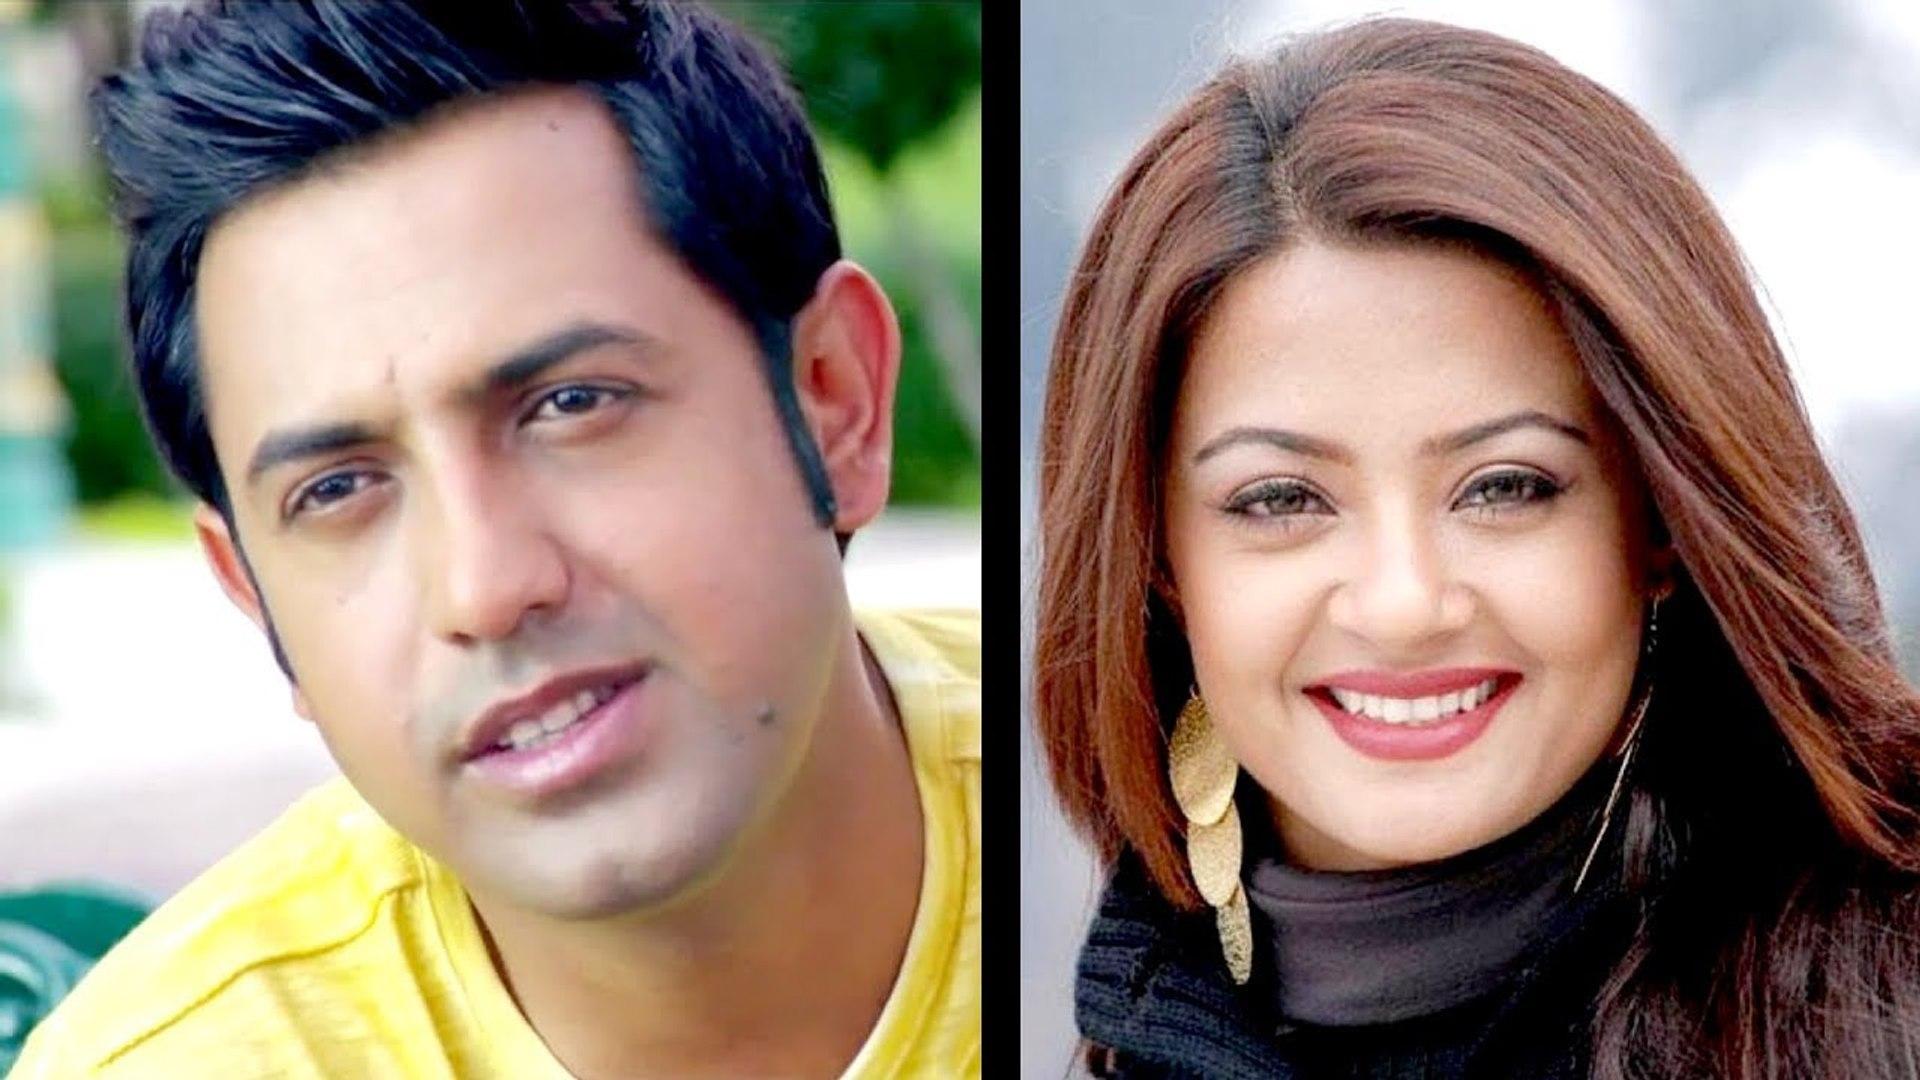 GIPPY GREWAL Part 1 FULL MOVIE 2017 | Punjabi Full Film 2017 Latest HD | New Punjabi Full Movie